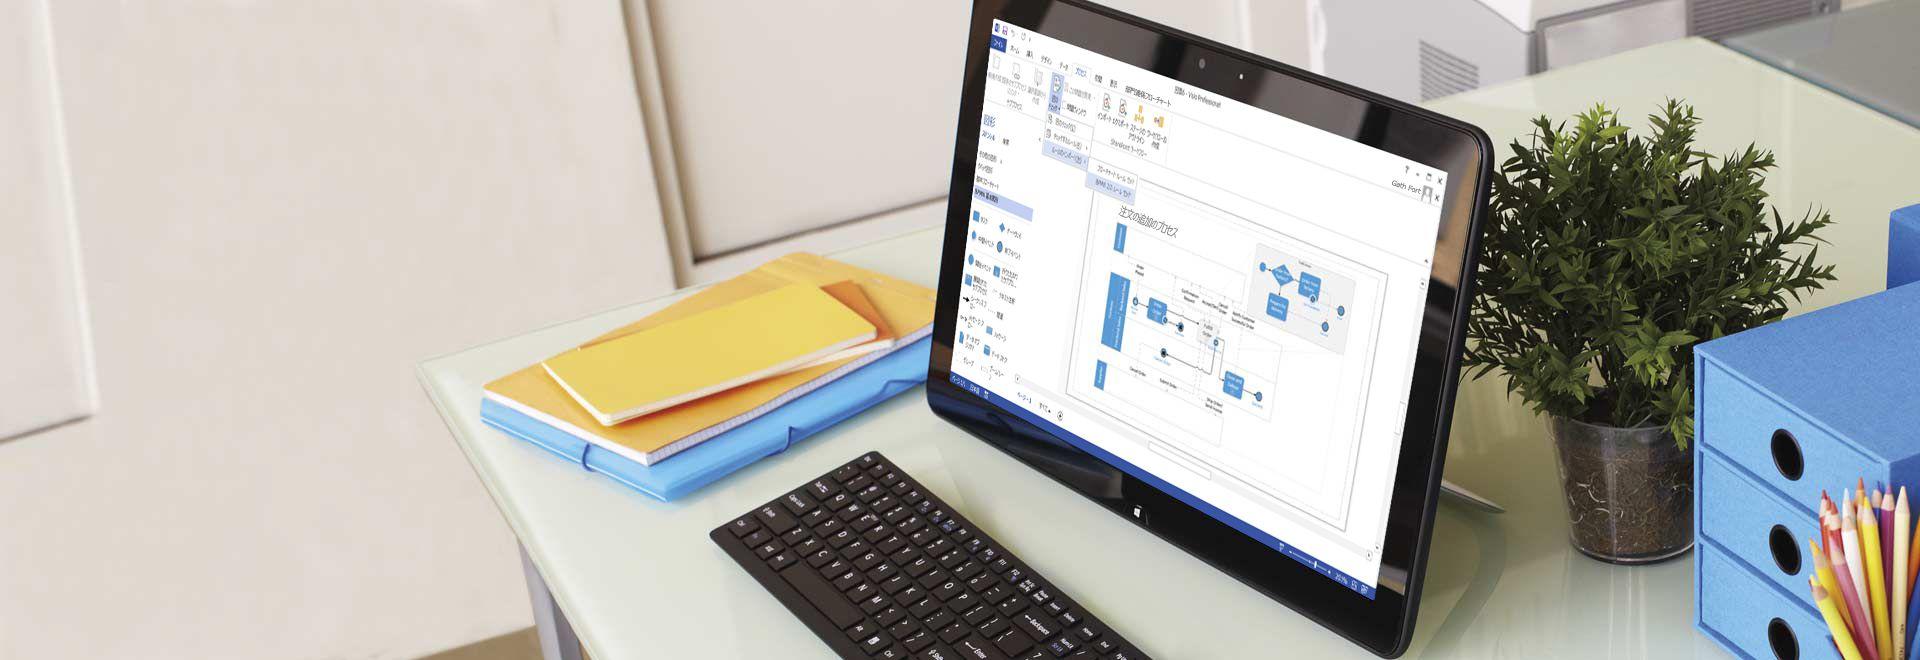 Visio Professional 2019 の画像でプロセス図を表示したタブレット コンピューターが置かれた机